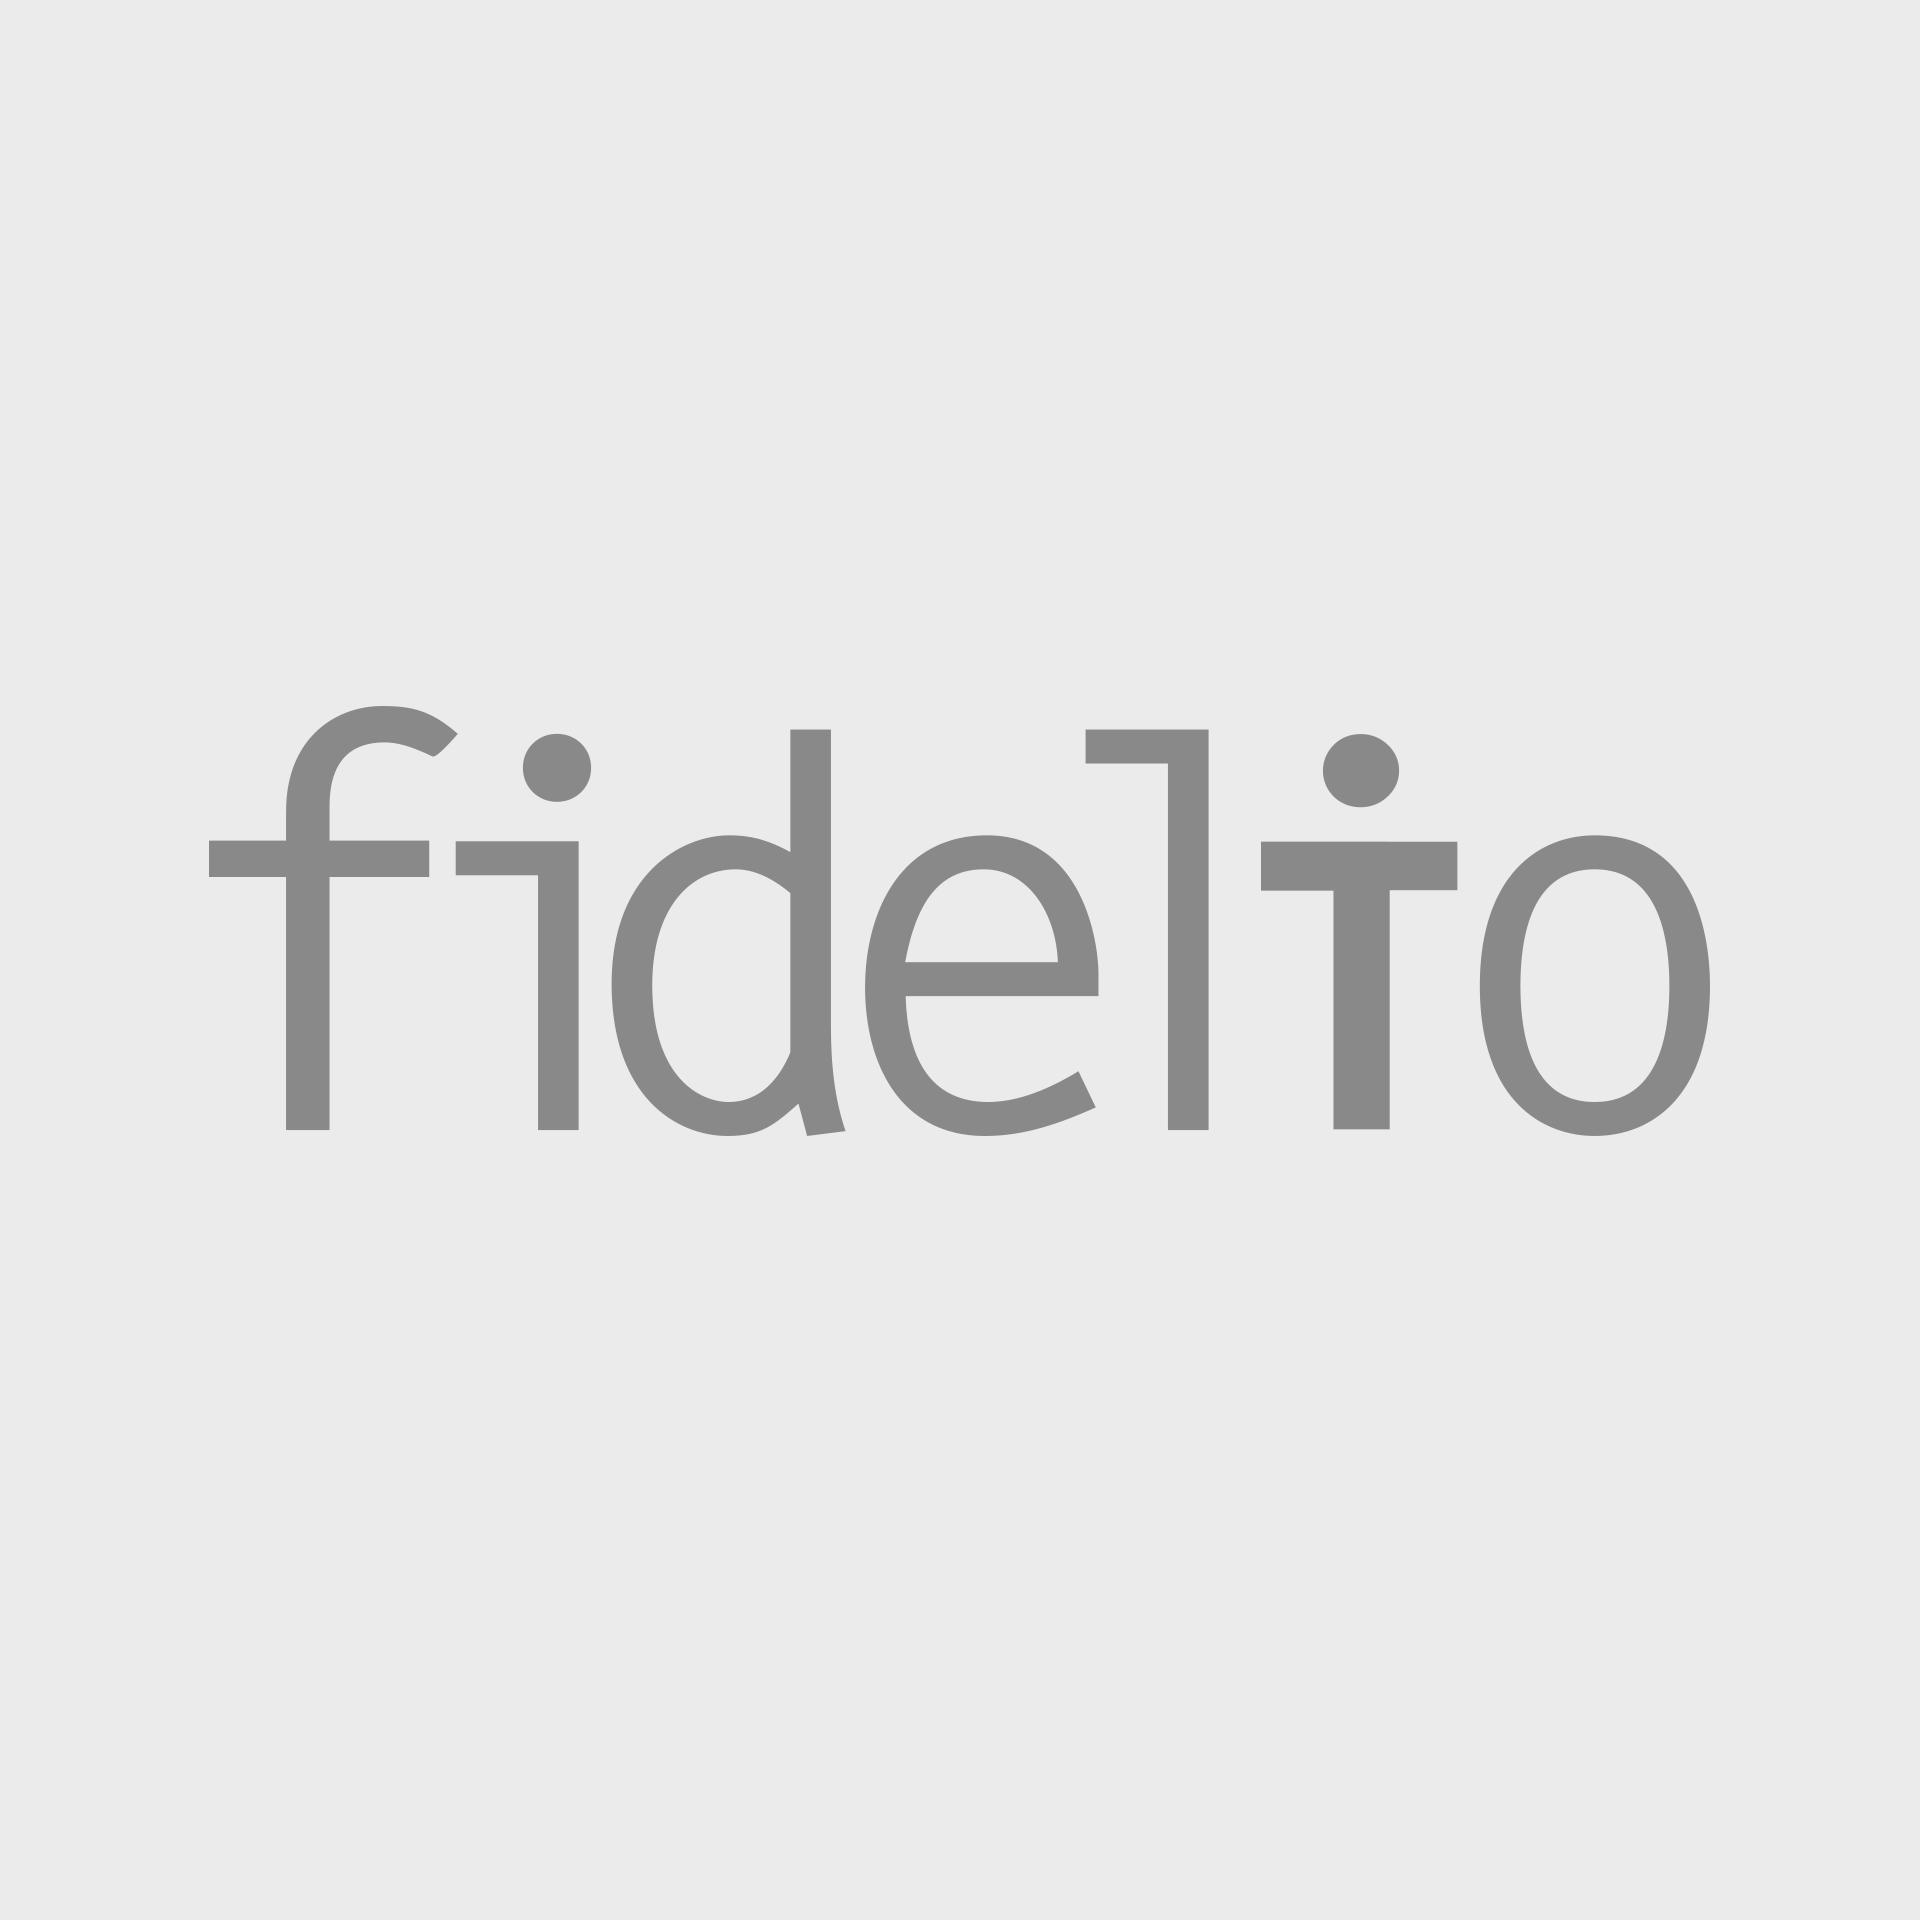 3A52AD53-CFD4-457F-AF09-212C2E930F36